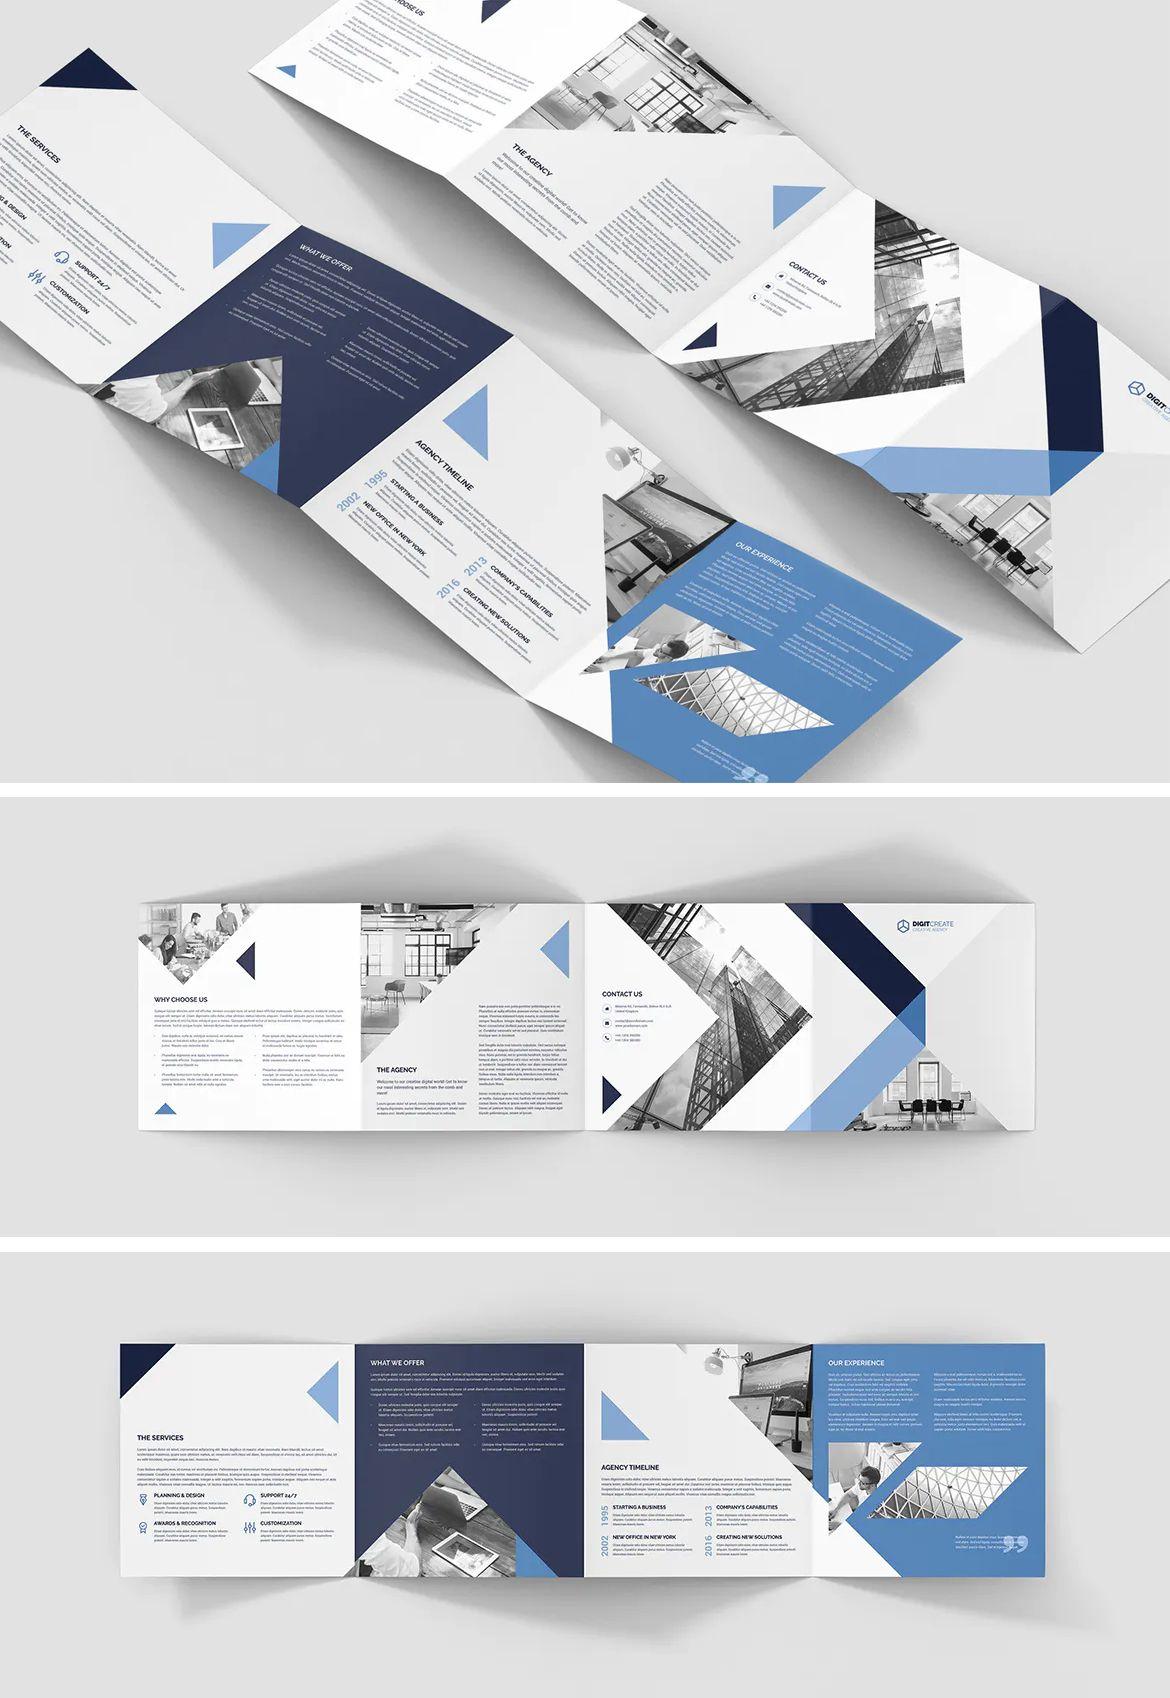 Digital Agency 4 Fold Square Brochure Template Psd Square Brochures Brochure Template Psd Brochure Template